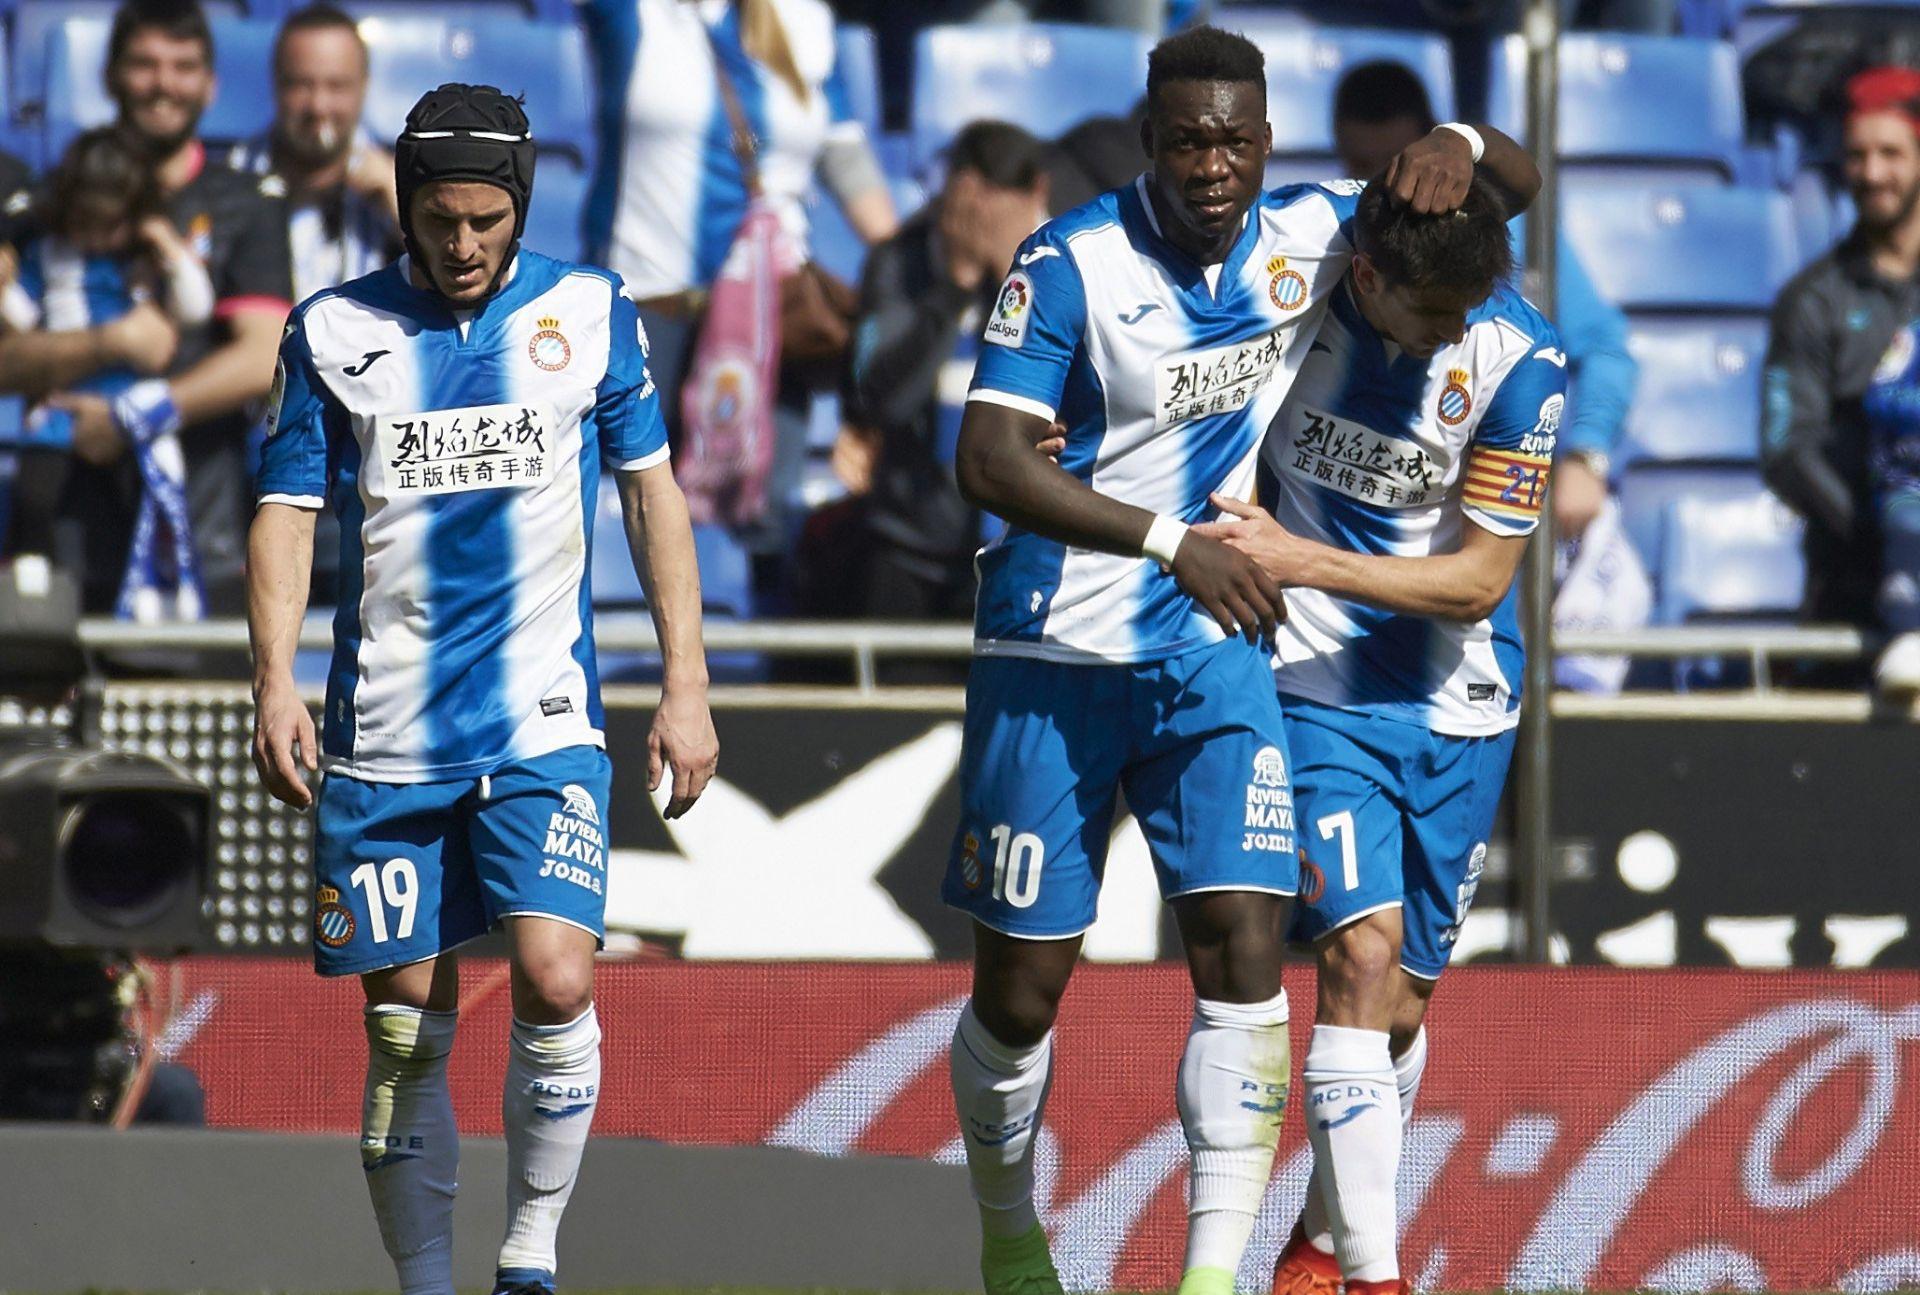 ŠPANJOLSKA Espanyol – Osasuna 3-0